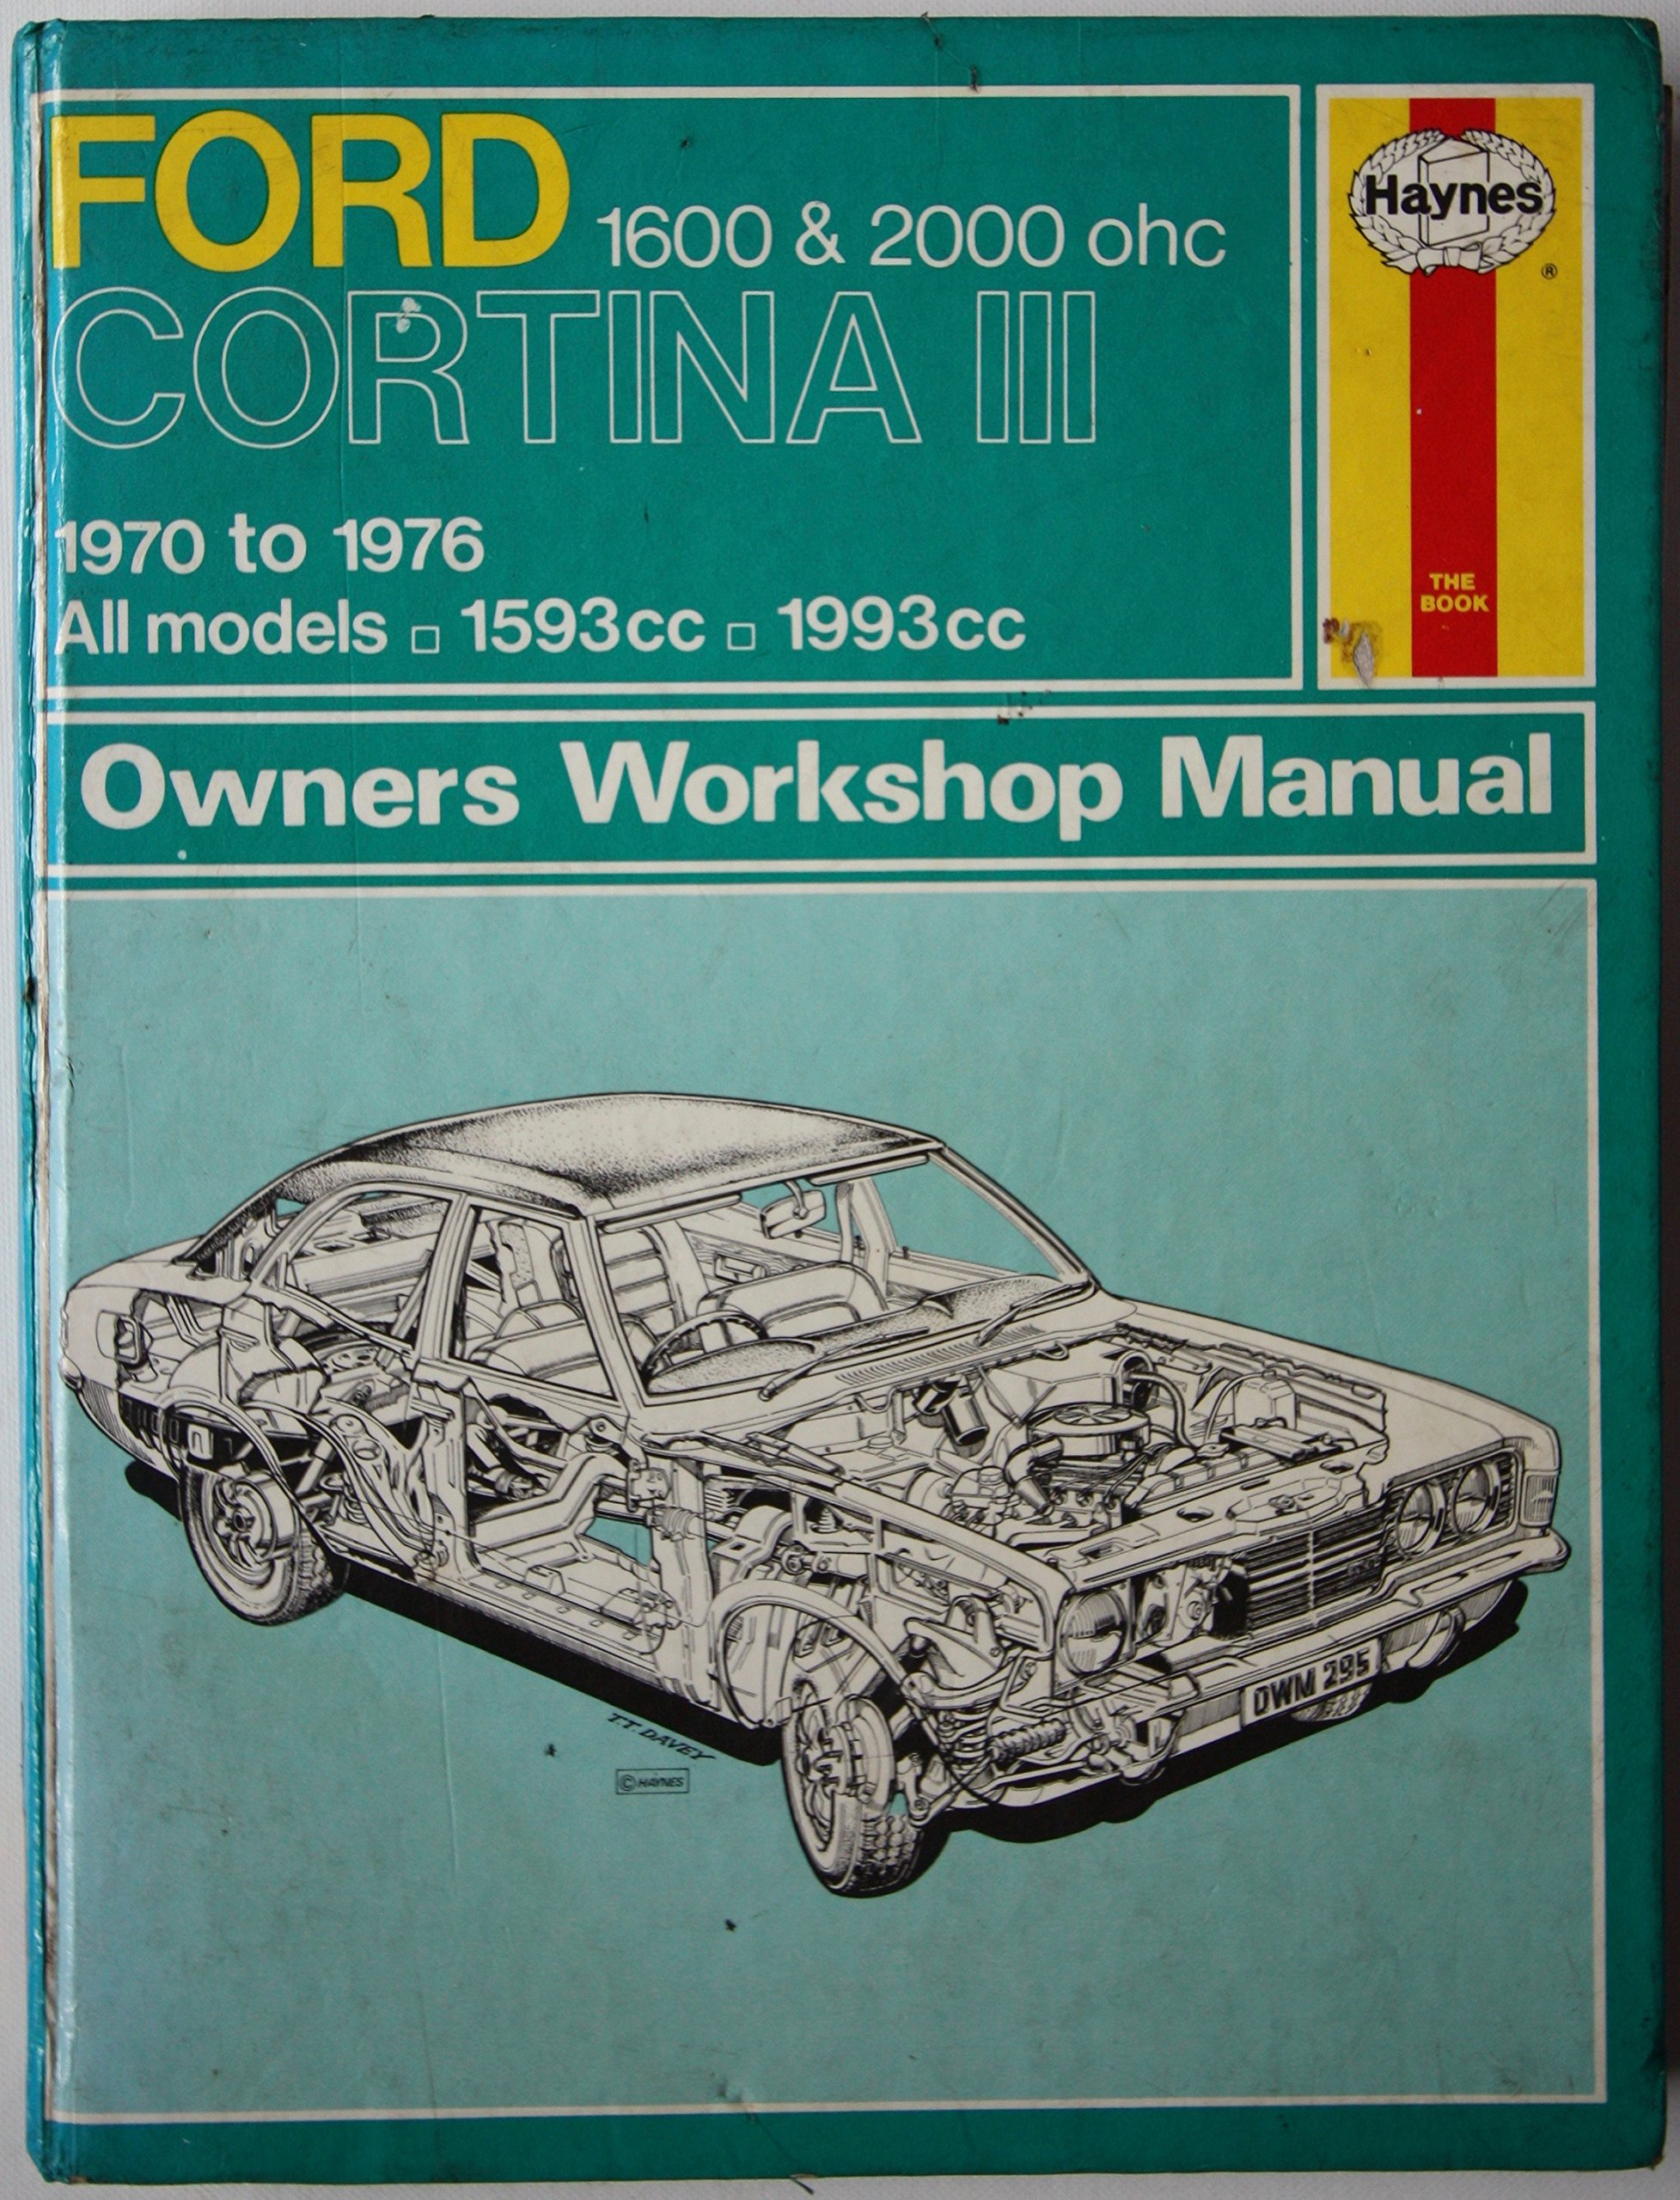 ford cortina mk iii 1600 and 2000 o h c owner s workshop manual rh amazon co uk